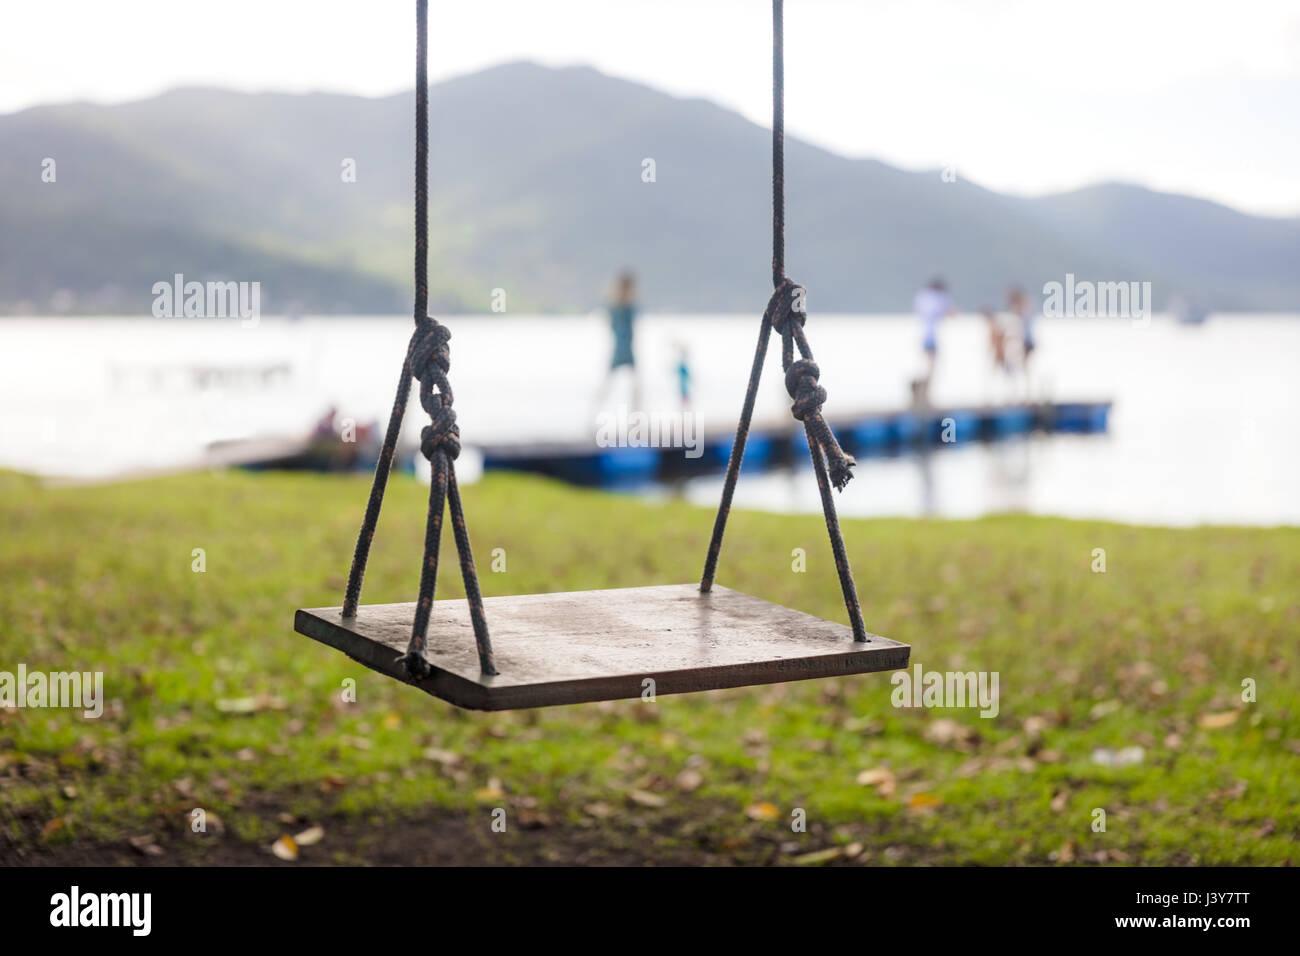 Empty swing seat, Florianopolis, Santa Catarina, Brazil - Stock Image